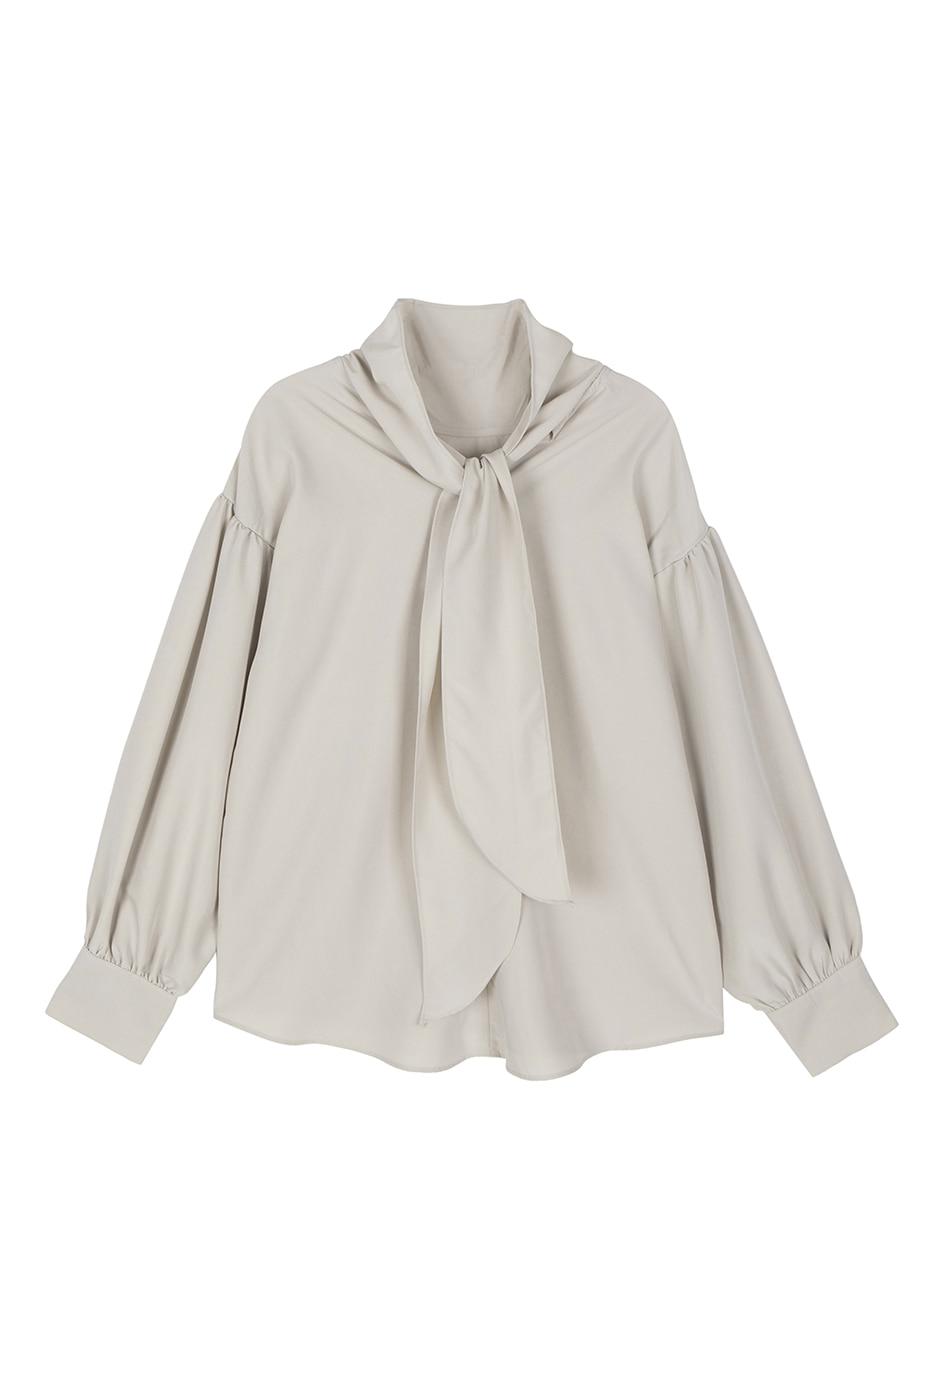 Rona tie blouse